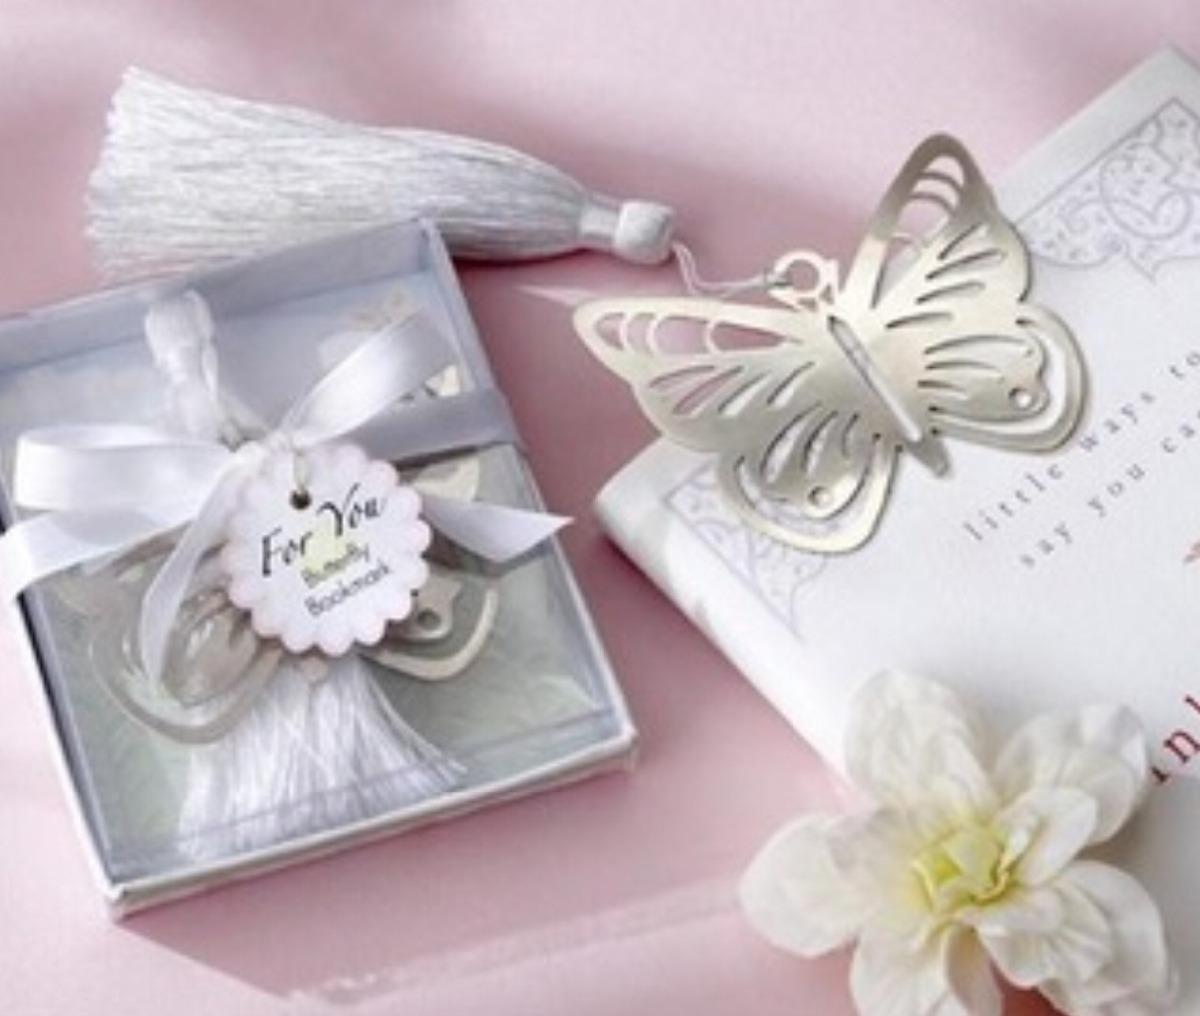 Cinderella Themed Bridal Shower Invitations is great invitation design